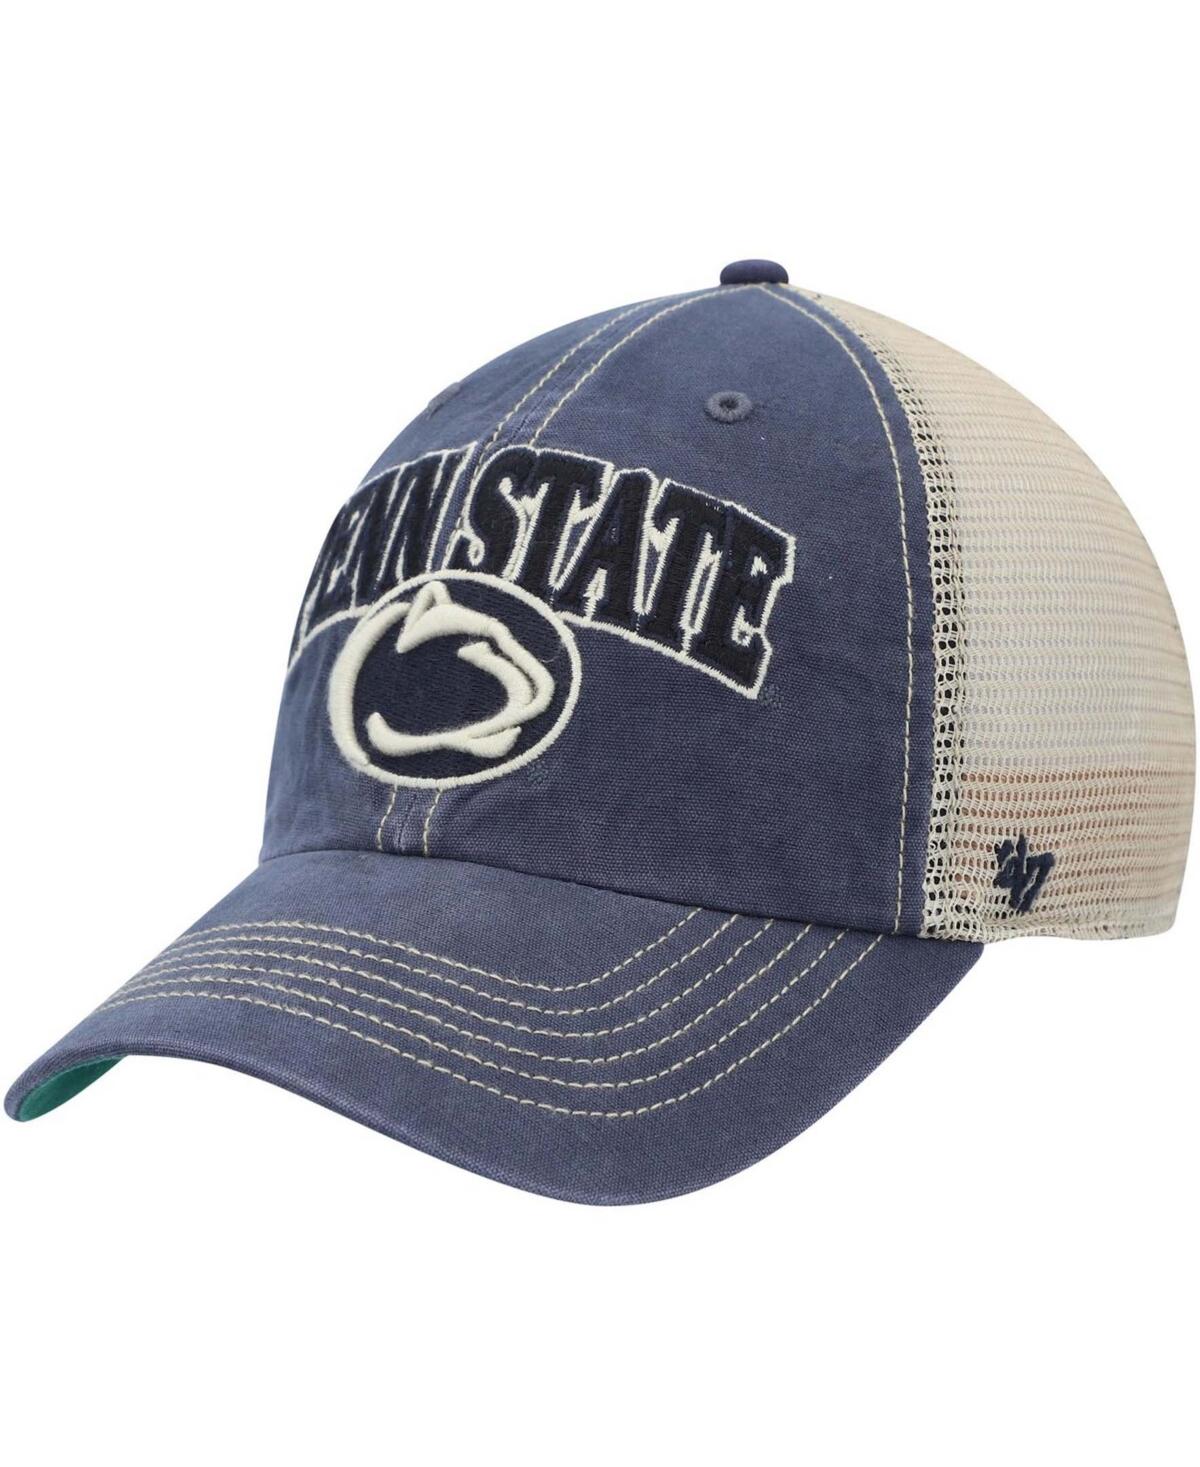 47 Brand Mens Penn State Nittany Lions Tuscaloosa Trucker Snapback Hat